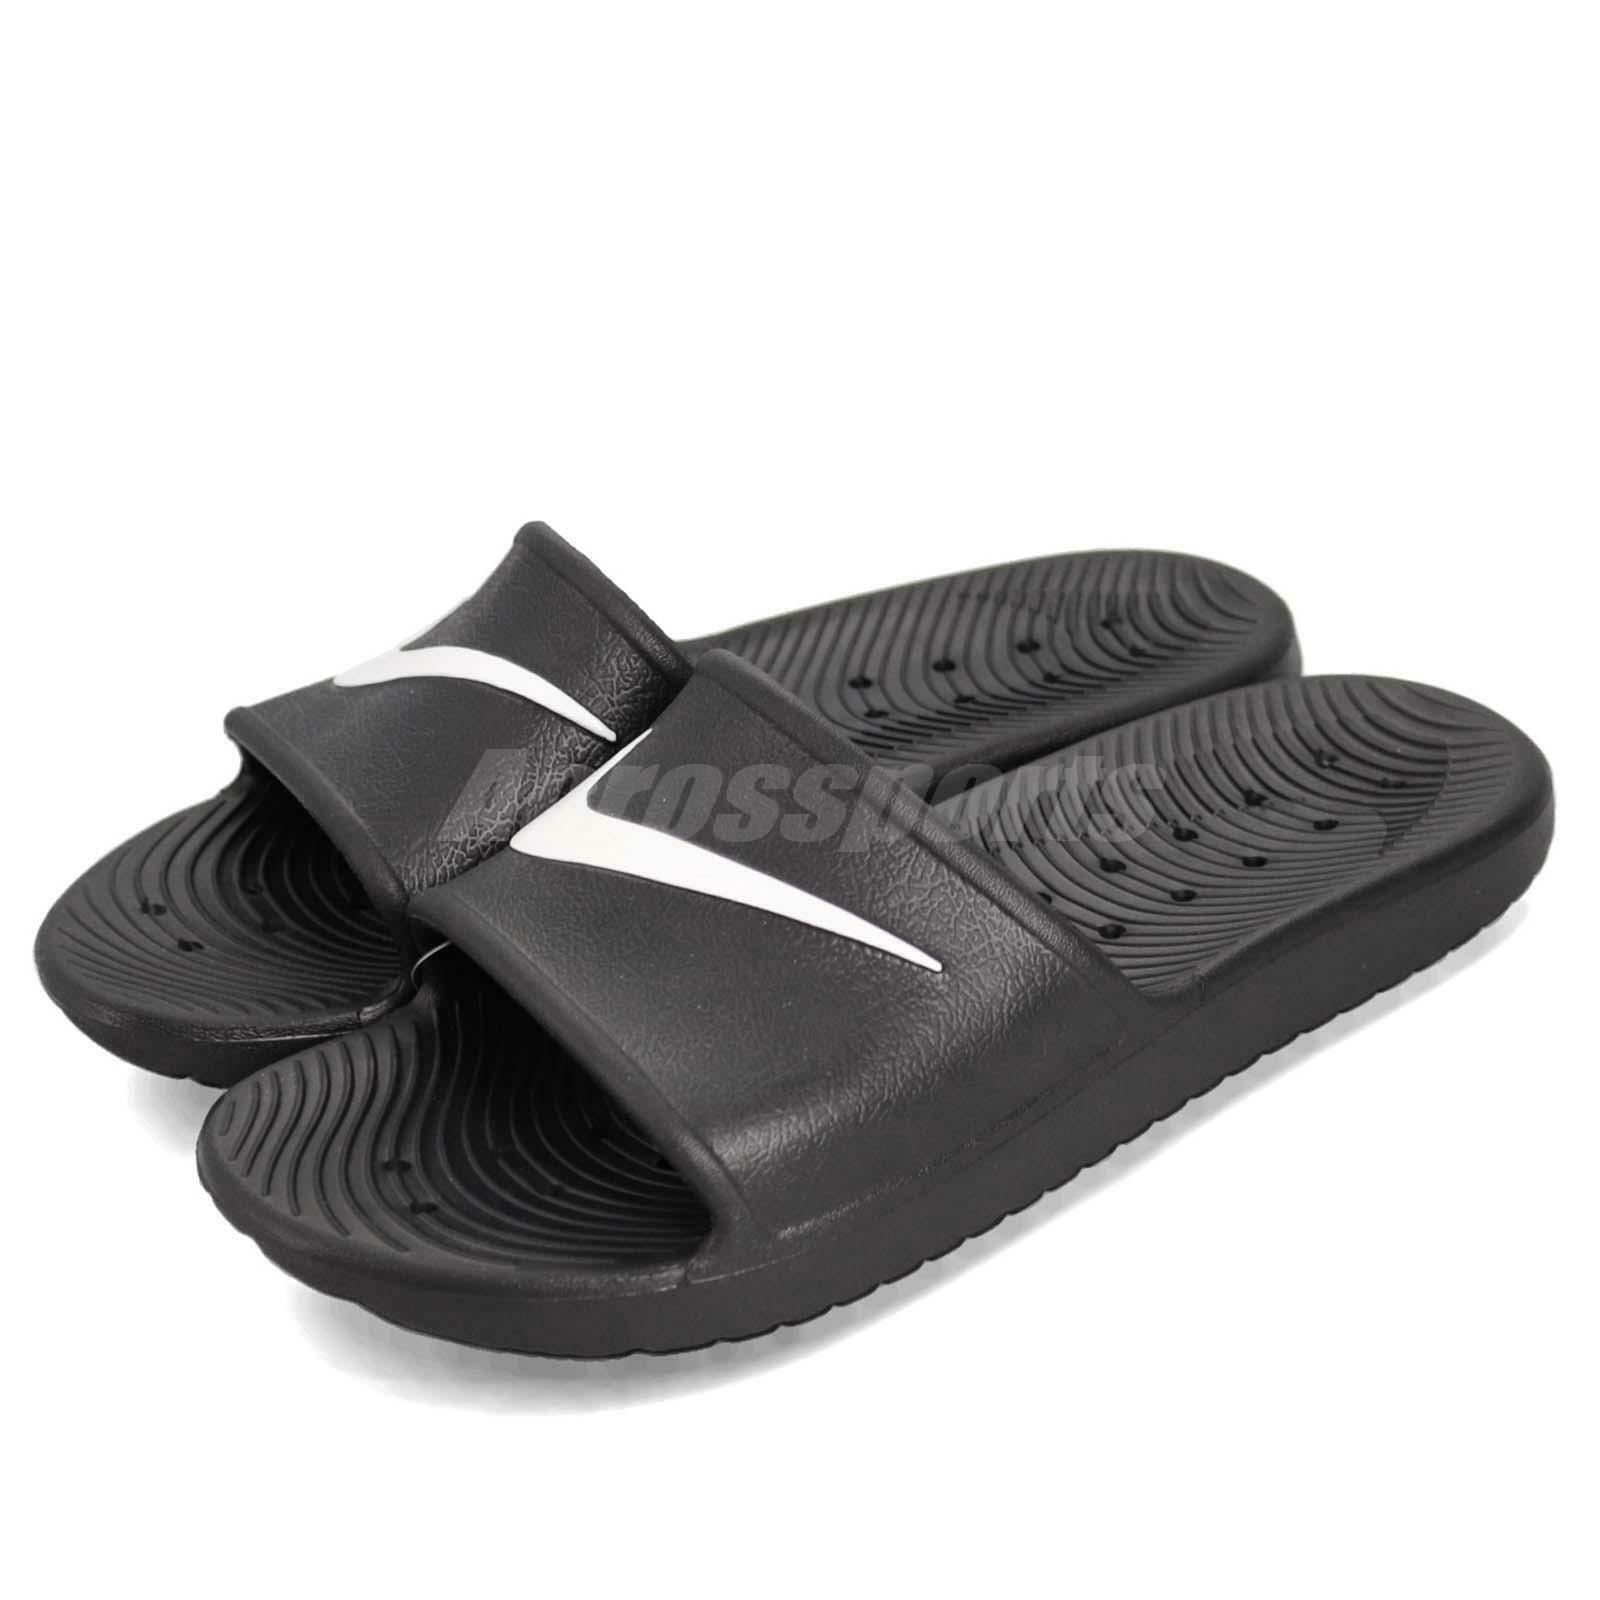 Nike KAWA SHOWER Men/'s Slide Black//White Slipper 832528 001  Free Shipping